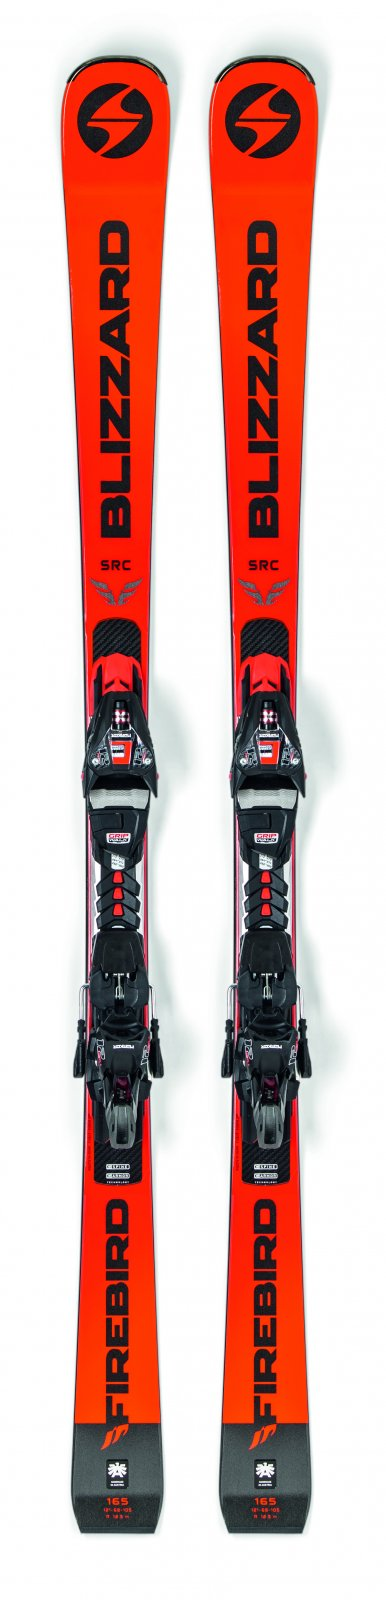 2020 Blizzard Firebird SRC Race Skis w/ Xcell 14 Bindings